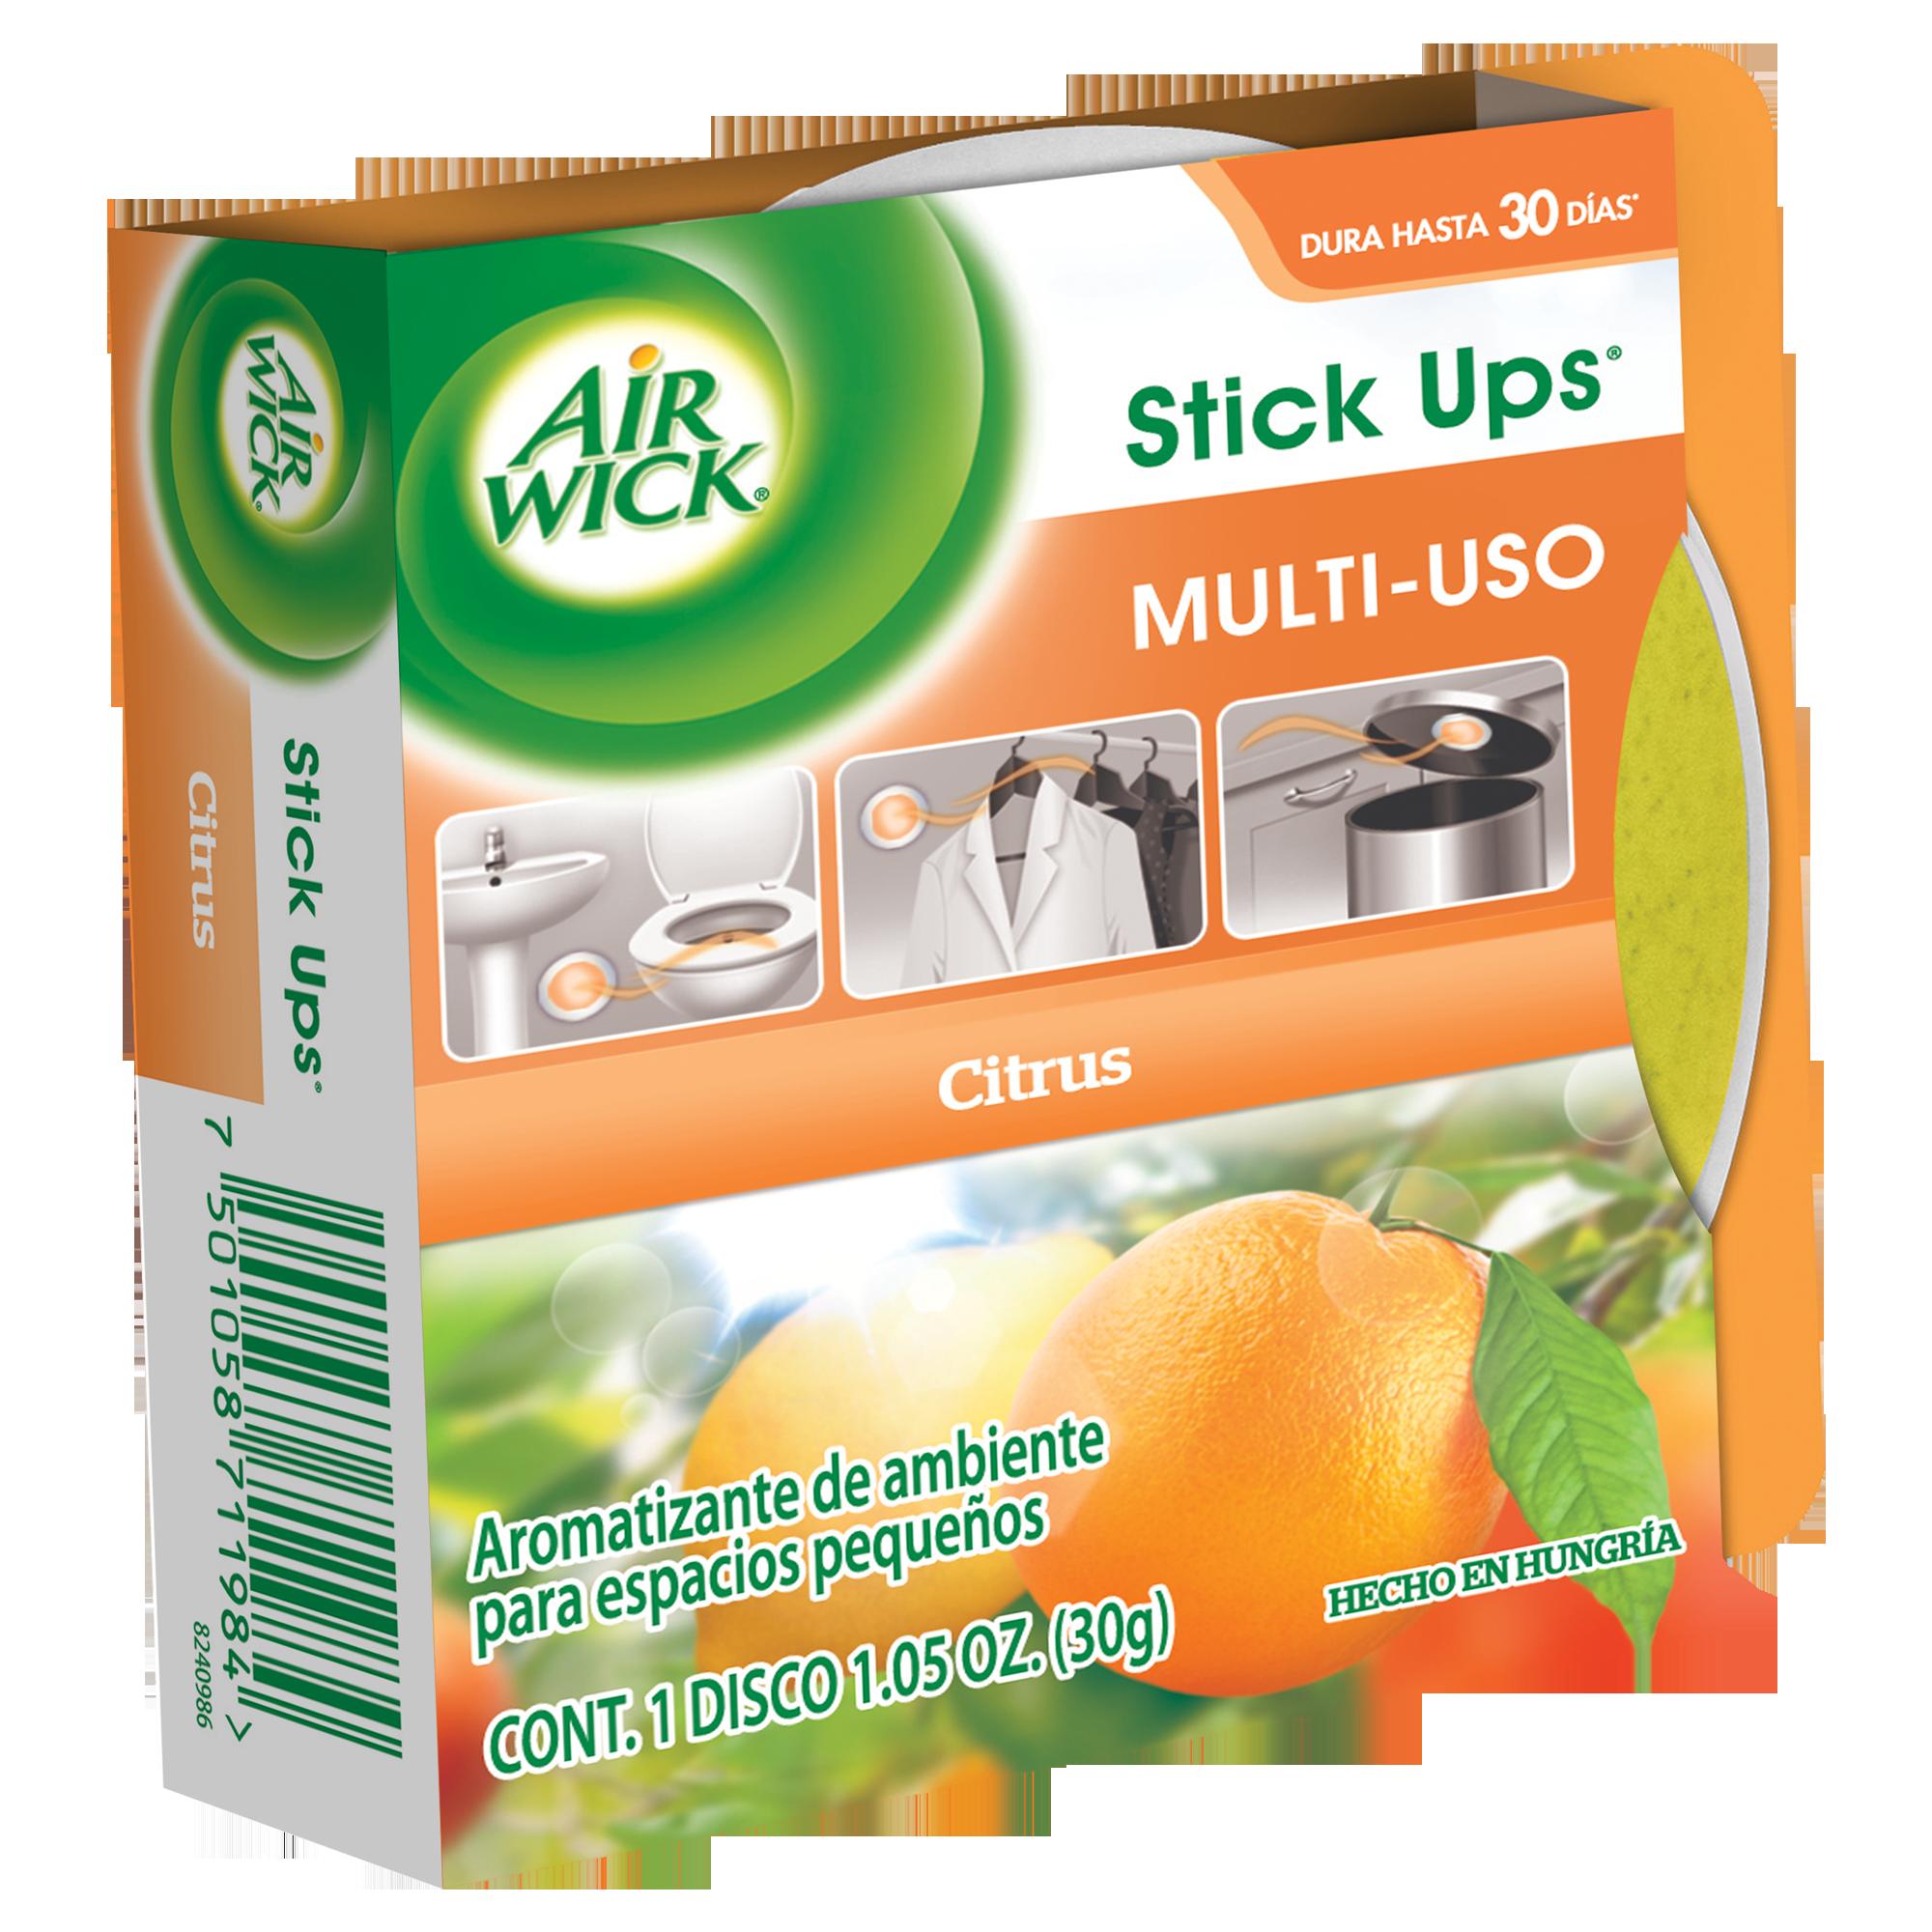 Air Wick® Stick Ups® Sparkling Citrus 30g